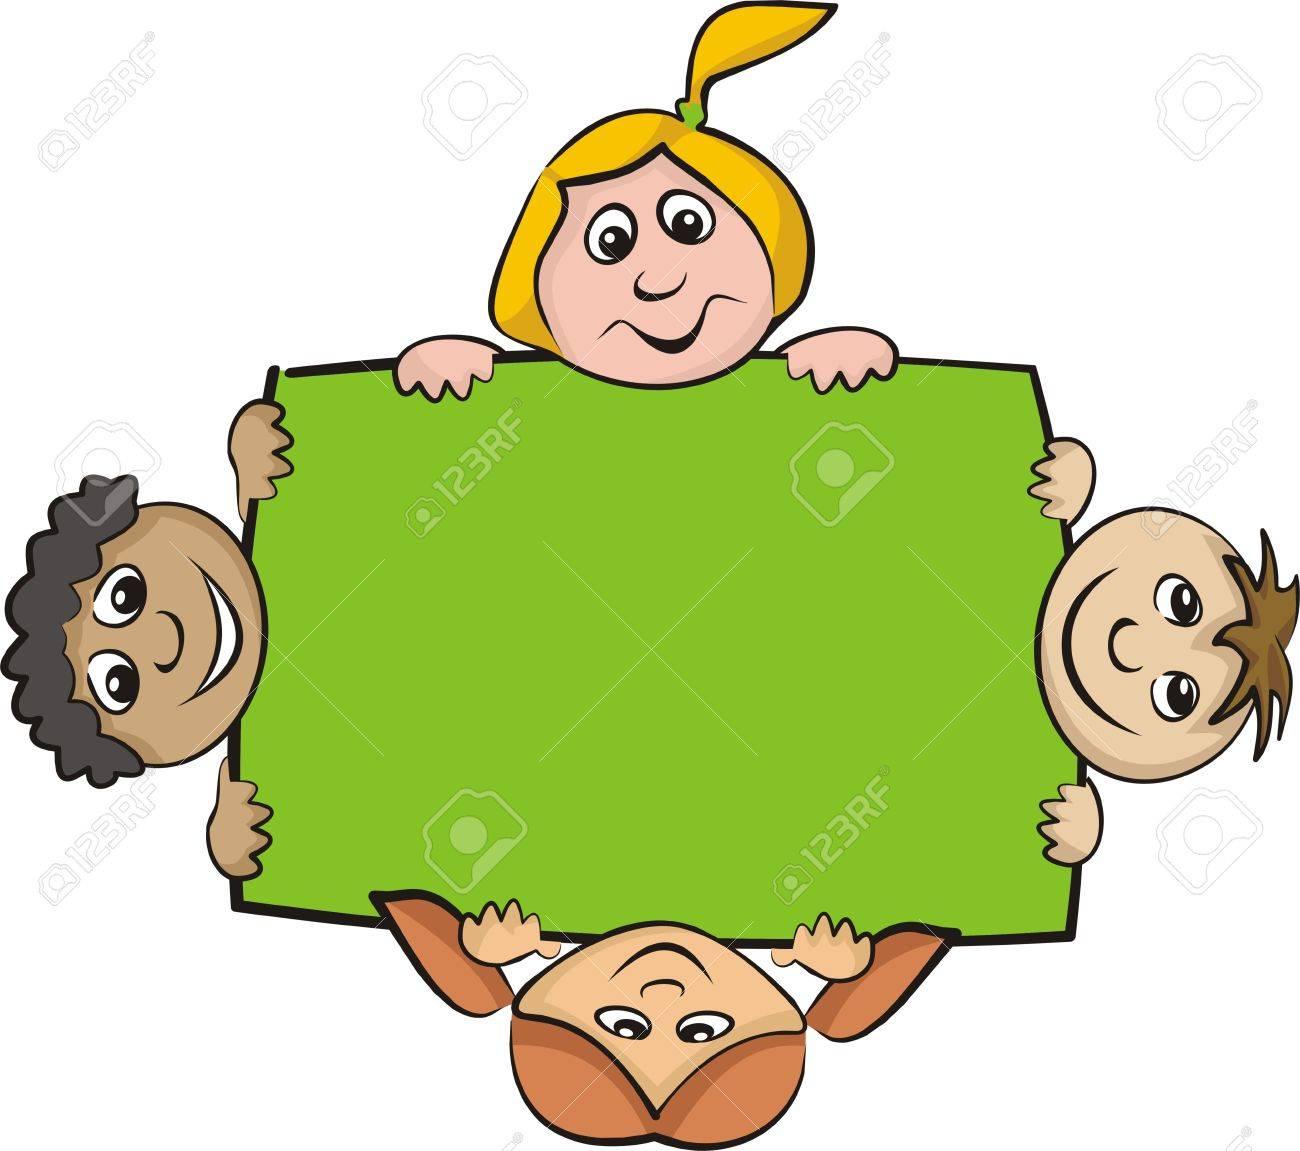 children around the billboard Stock Vector - 13016815